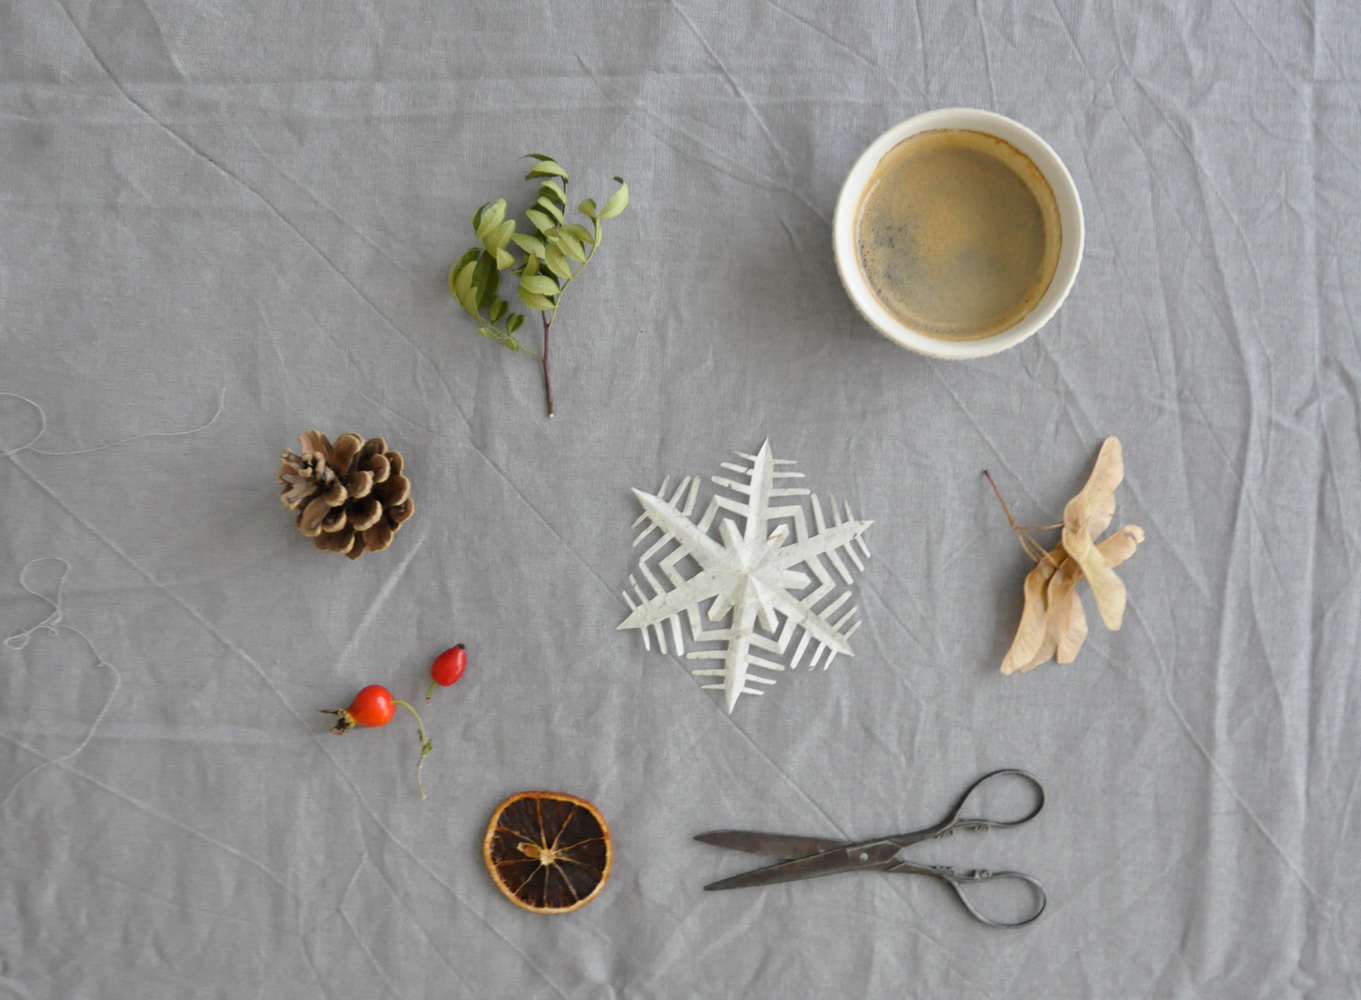 coffeeDIY Schneeflocke Papier Falten 04 - DIY | KW 41